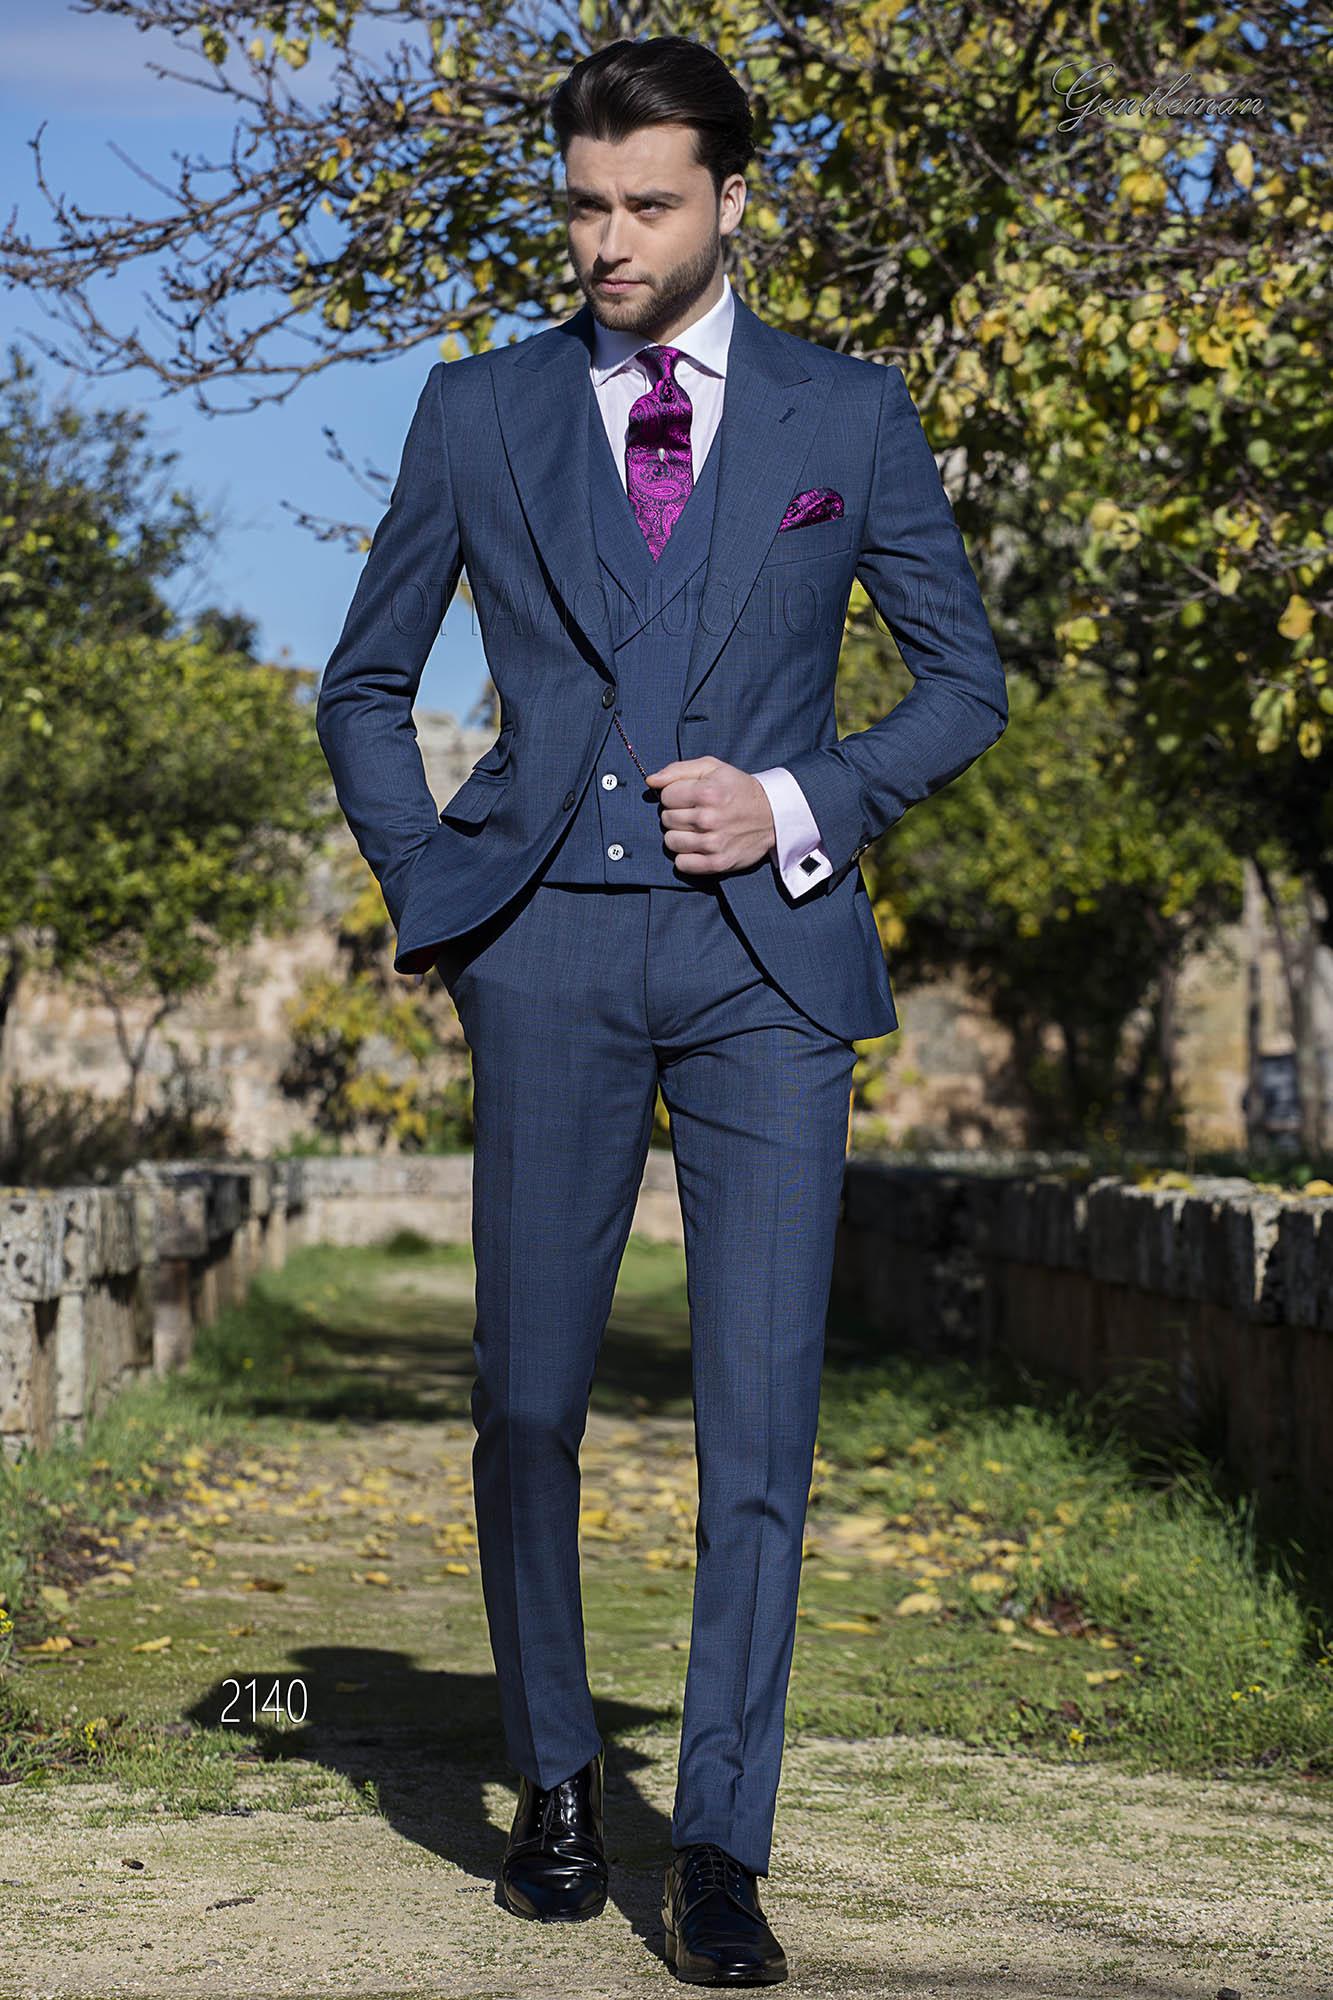 Outfit Matrimonio Uomo Gilet : Costume prince de galles bleu avec gilet croisé mariage